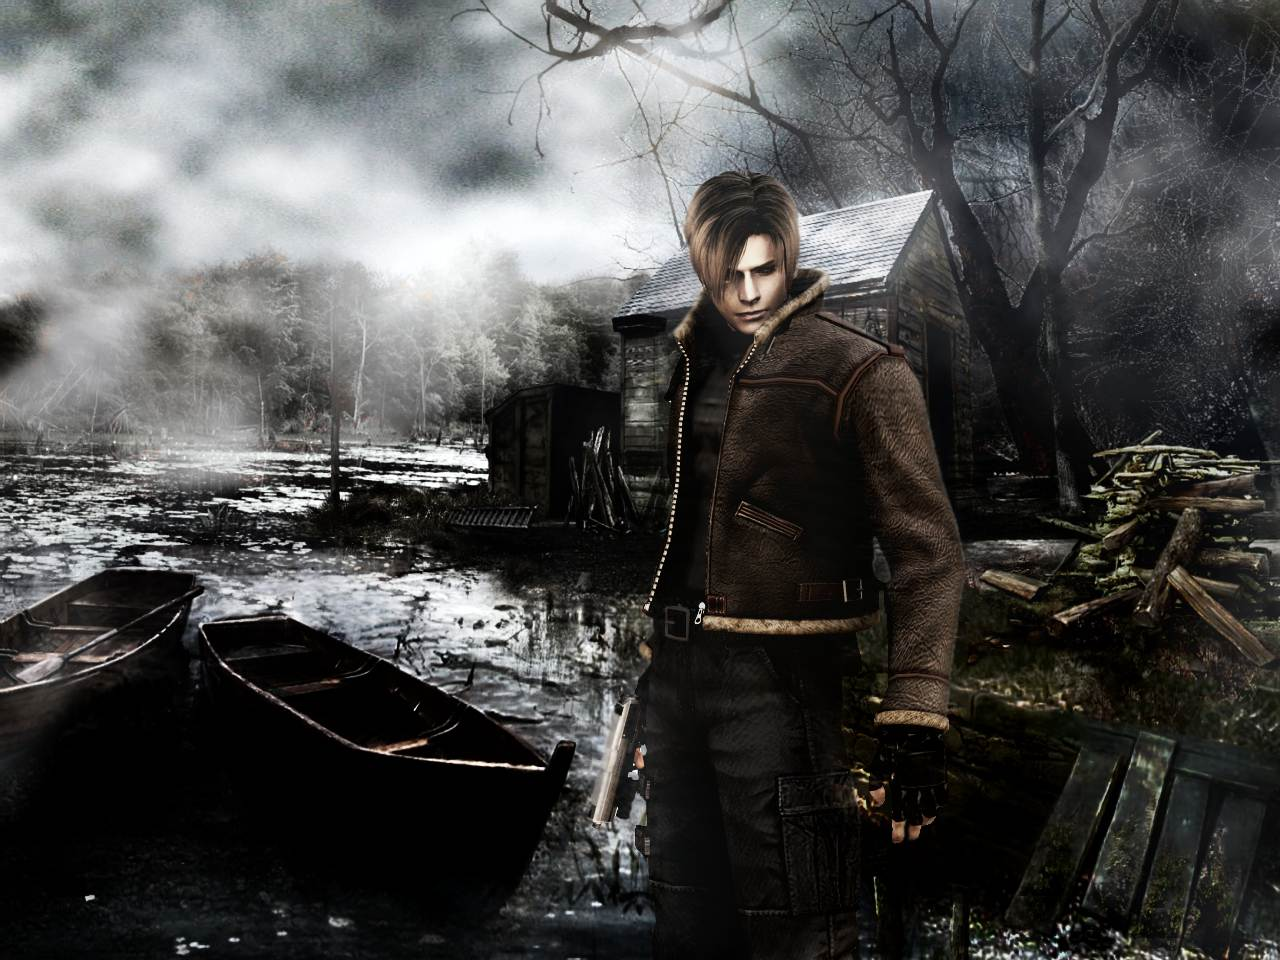 Unikly informace o údajném konceptu Resident Evil 8?